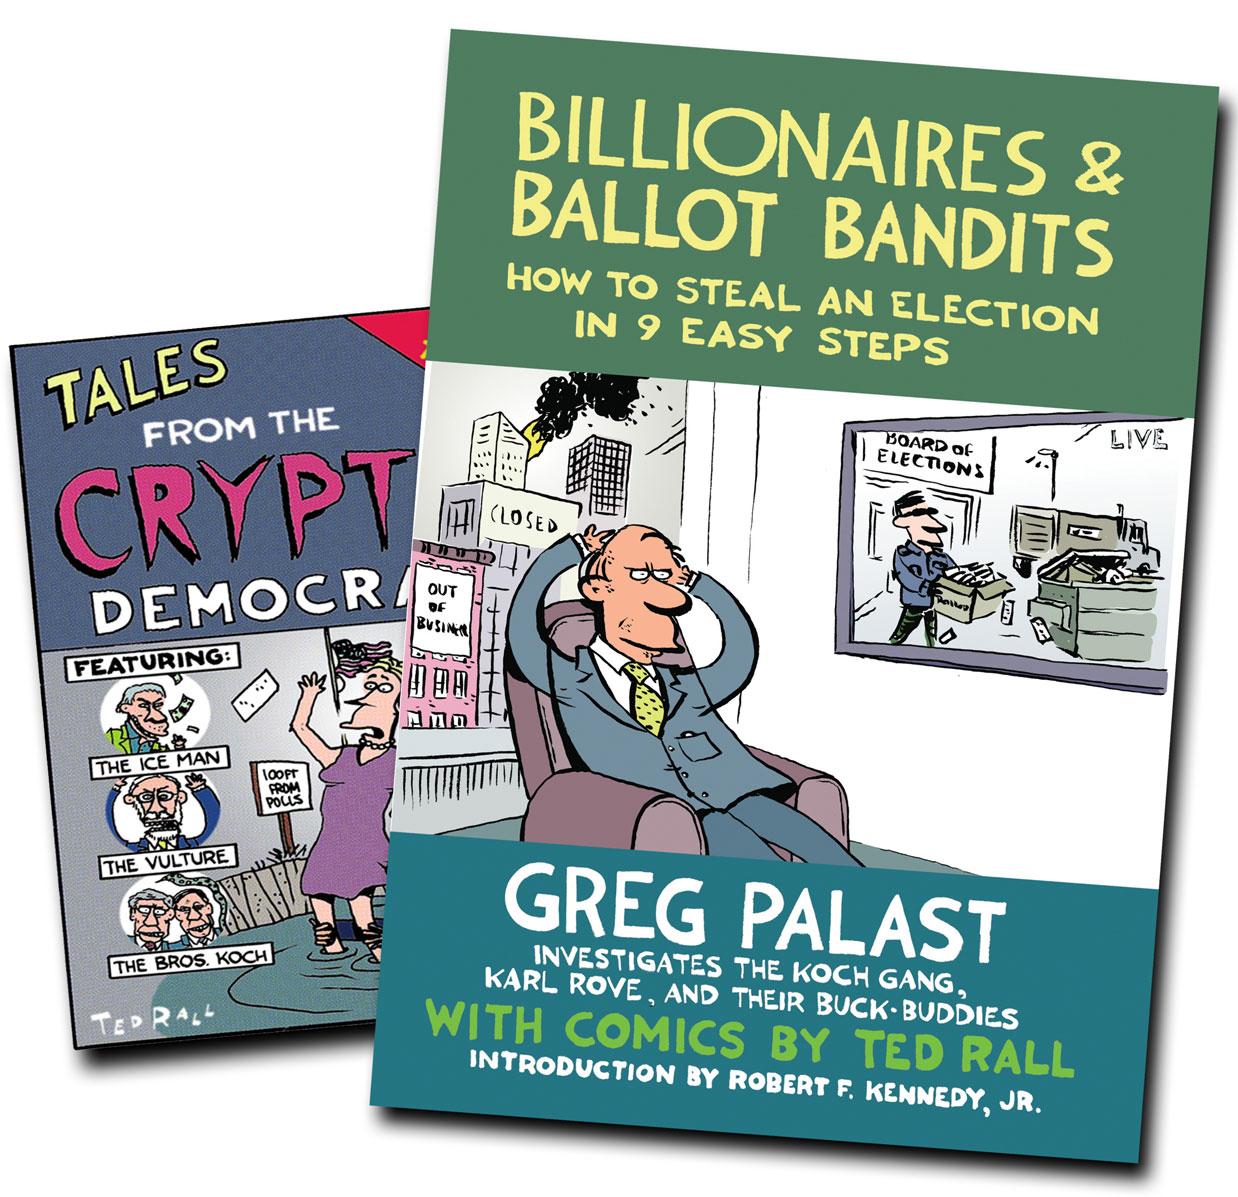 Greg Palast, Billionaires & Ballot Bandits